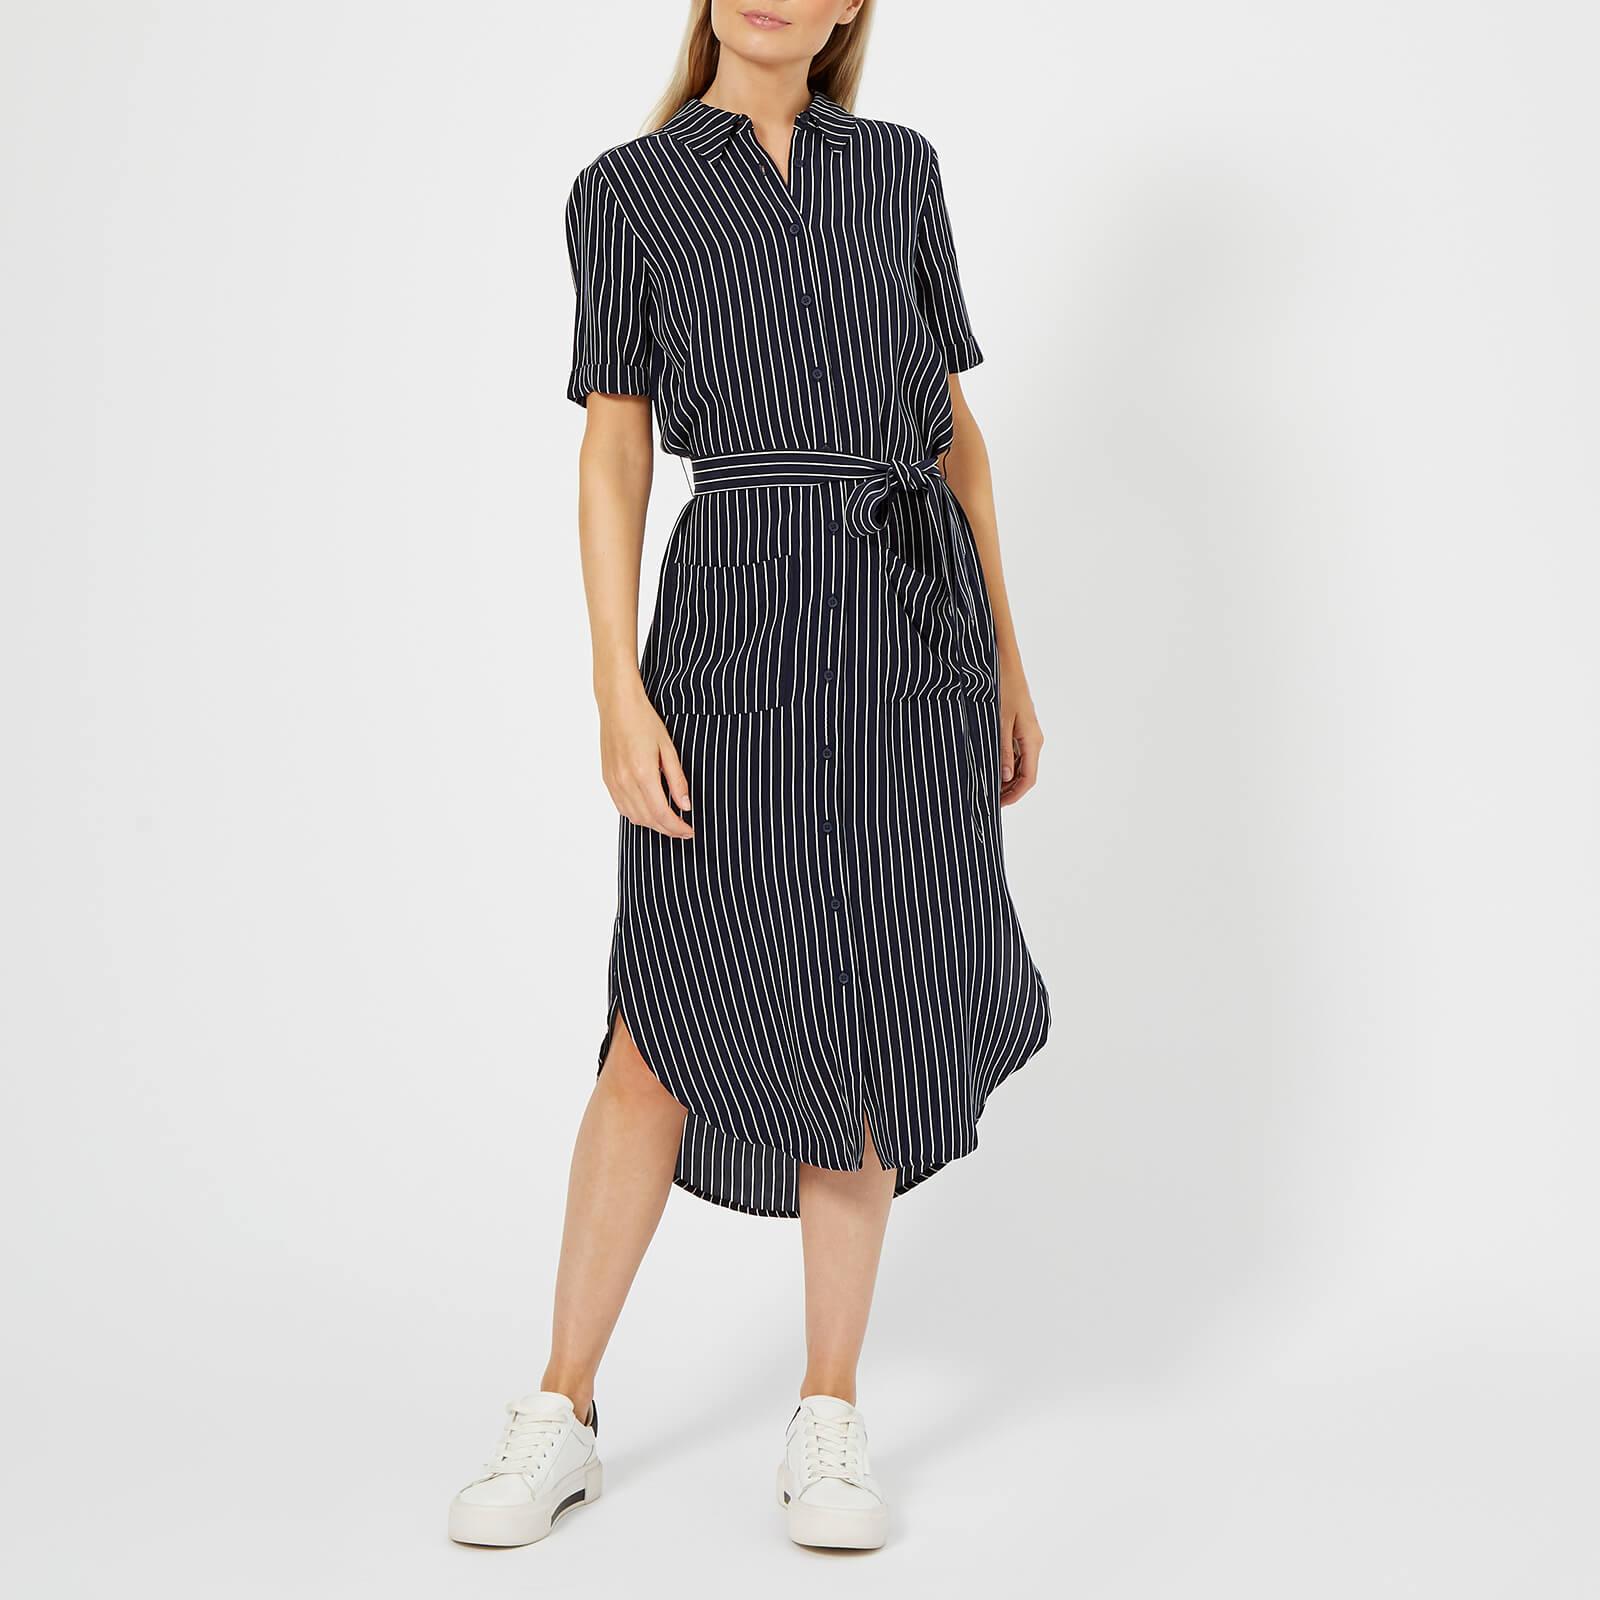 849e296deee Whistles Women s Montana Longline Stripe Shirt Dress - Navy Multi Womens  Clothing